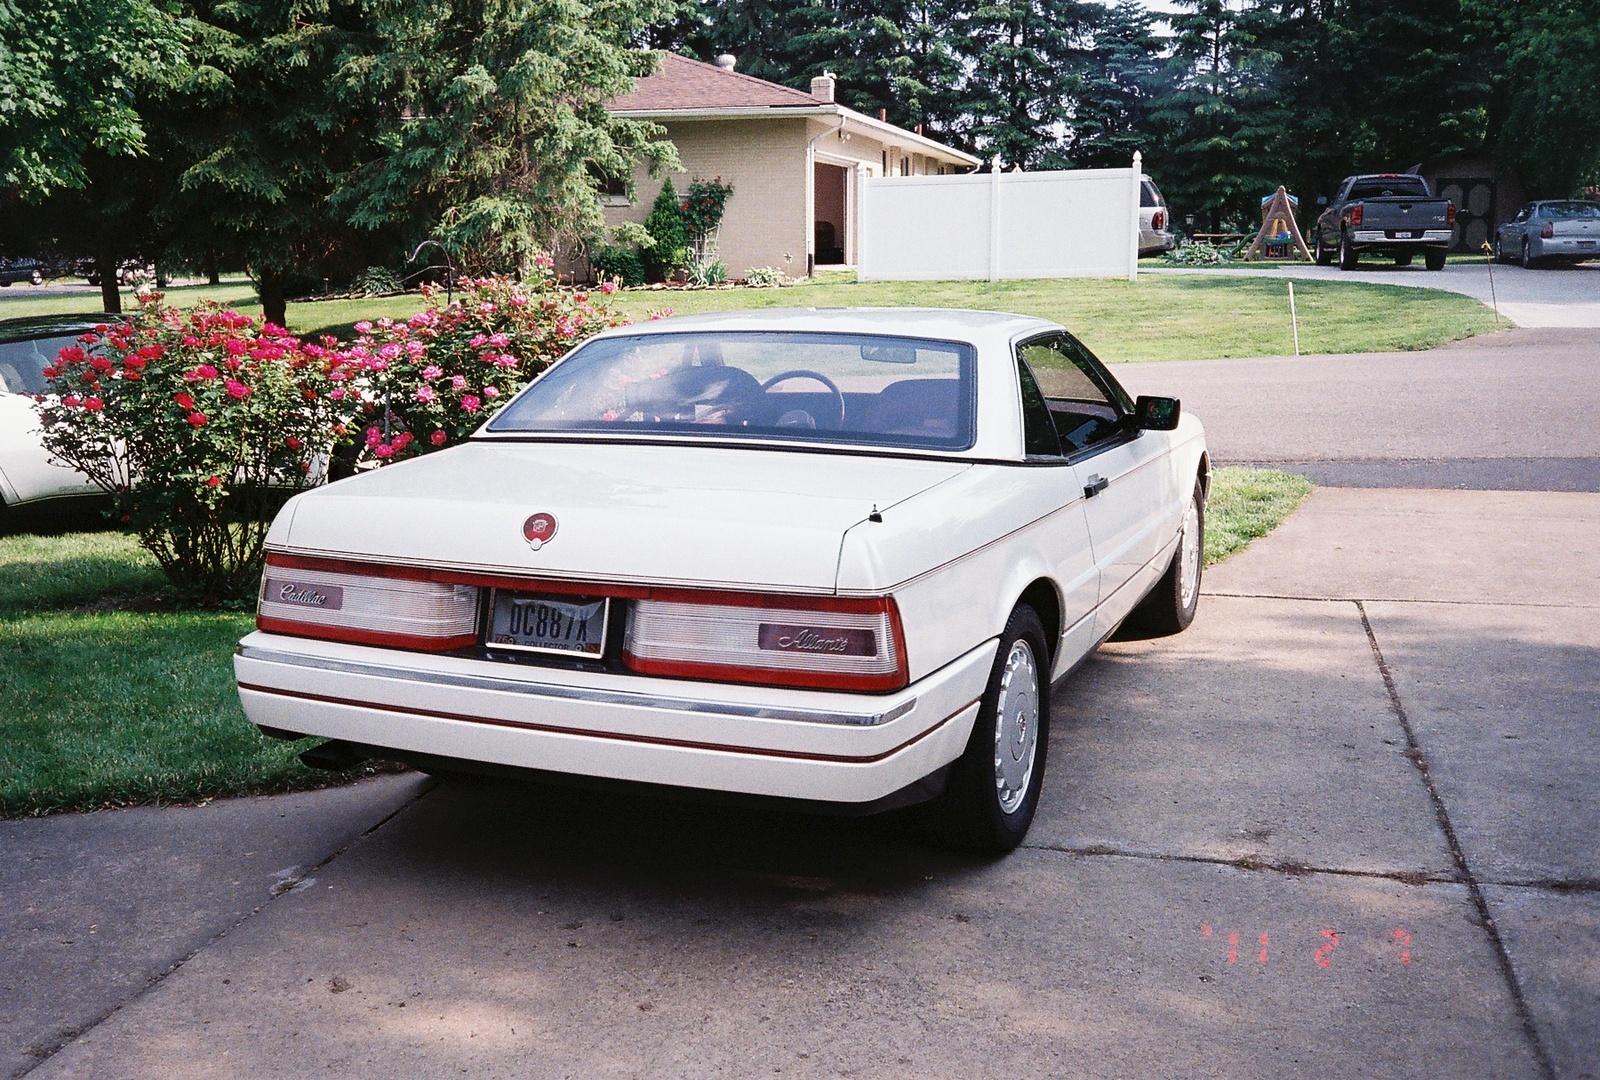 1989 Cadillac Allante - Overview - CarGurus